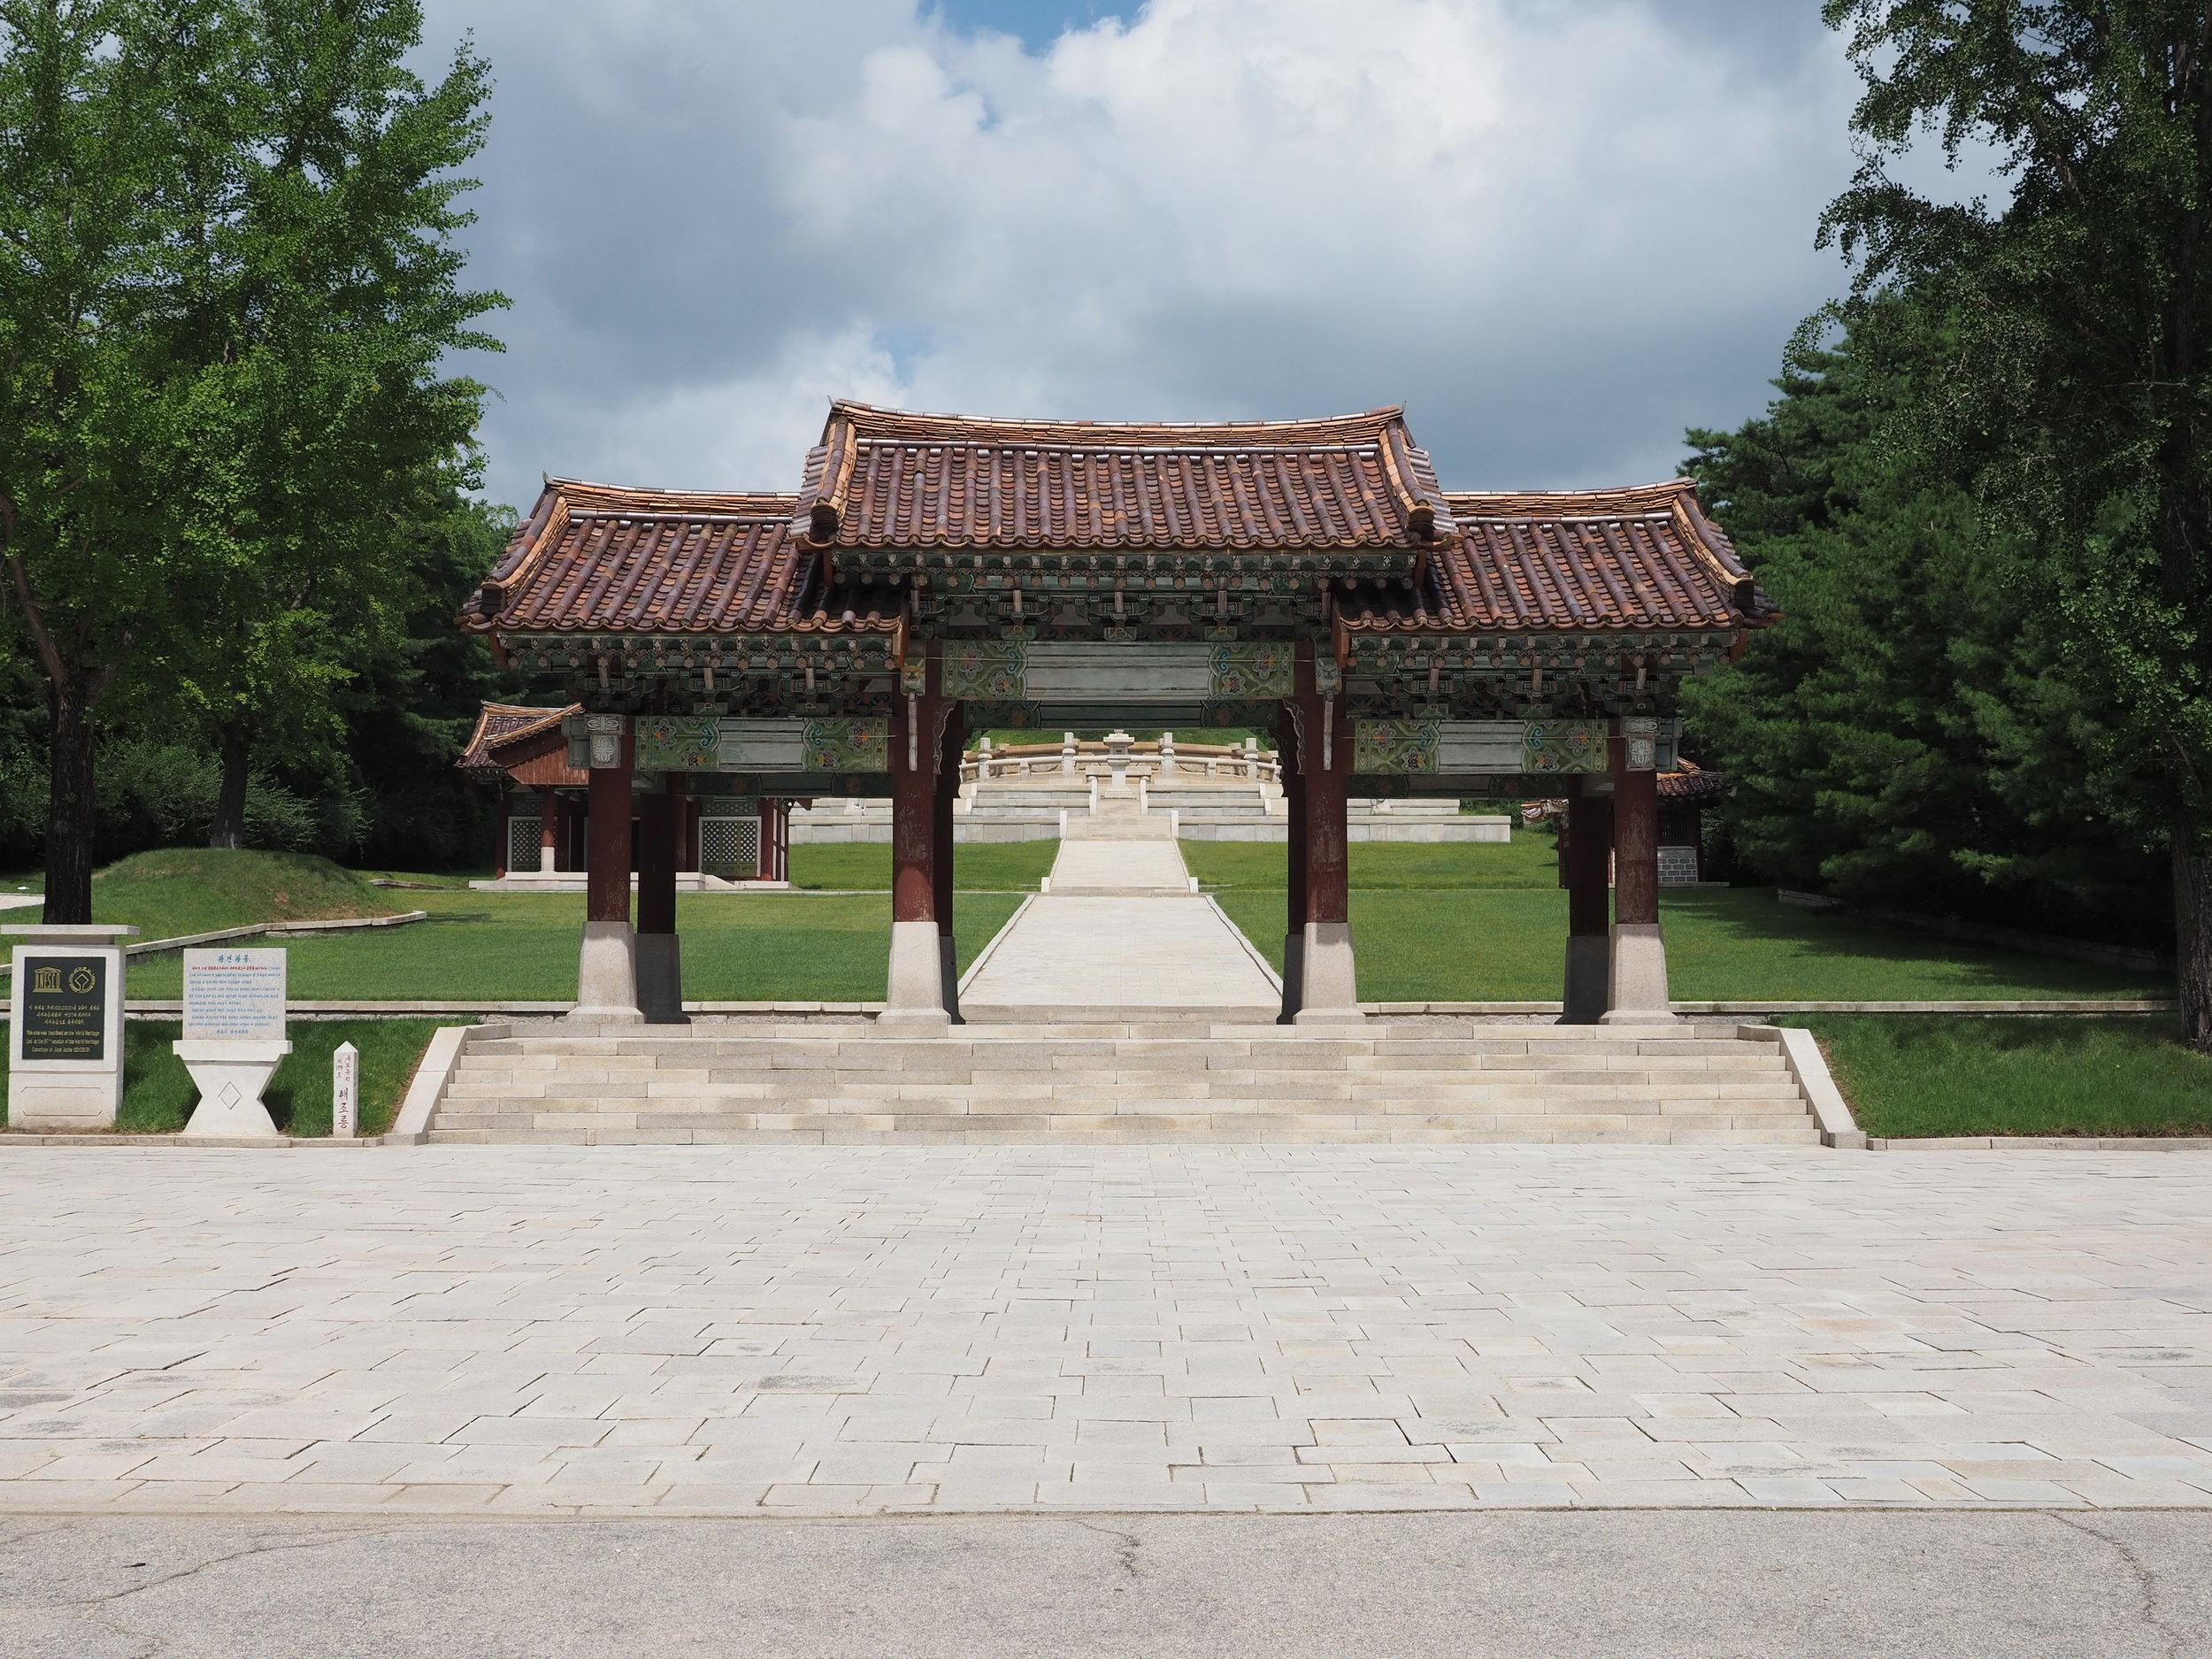 Entrance to King Wanggon's Tomb